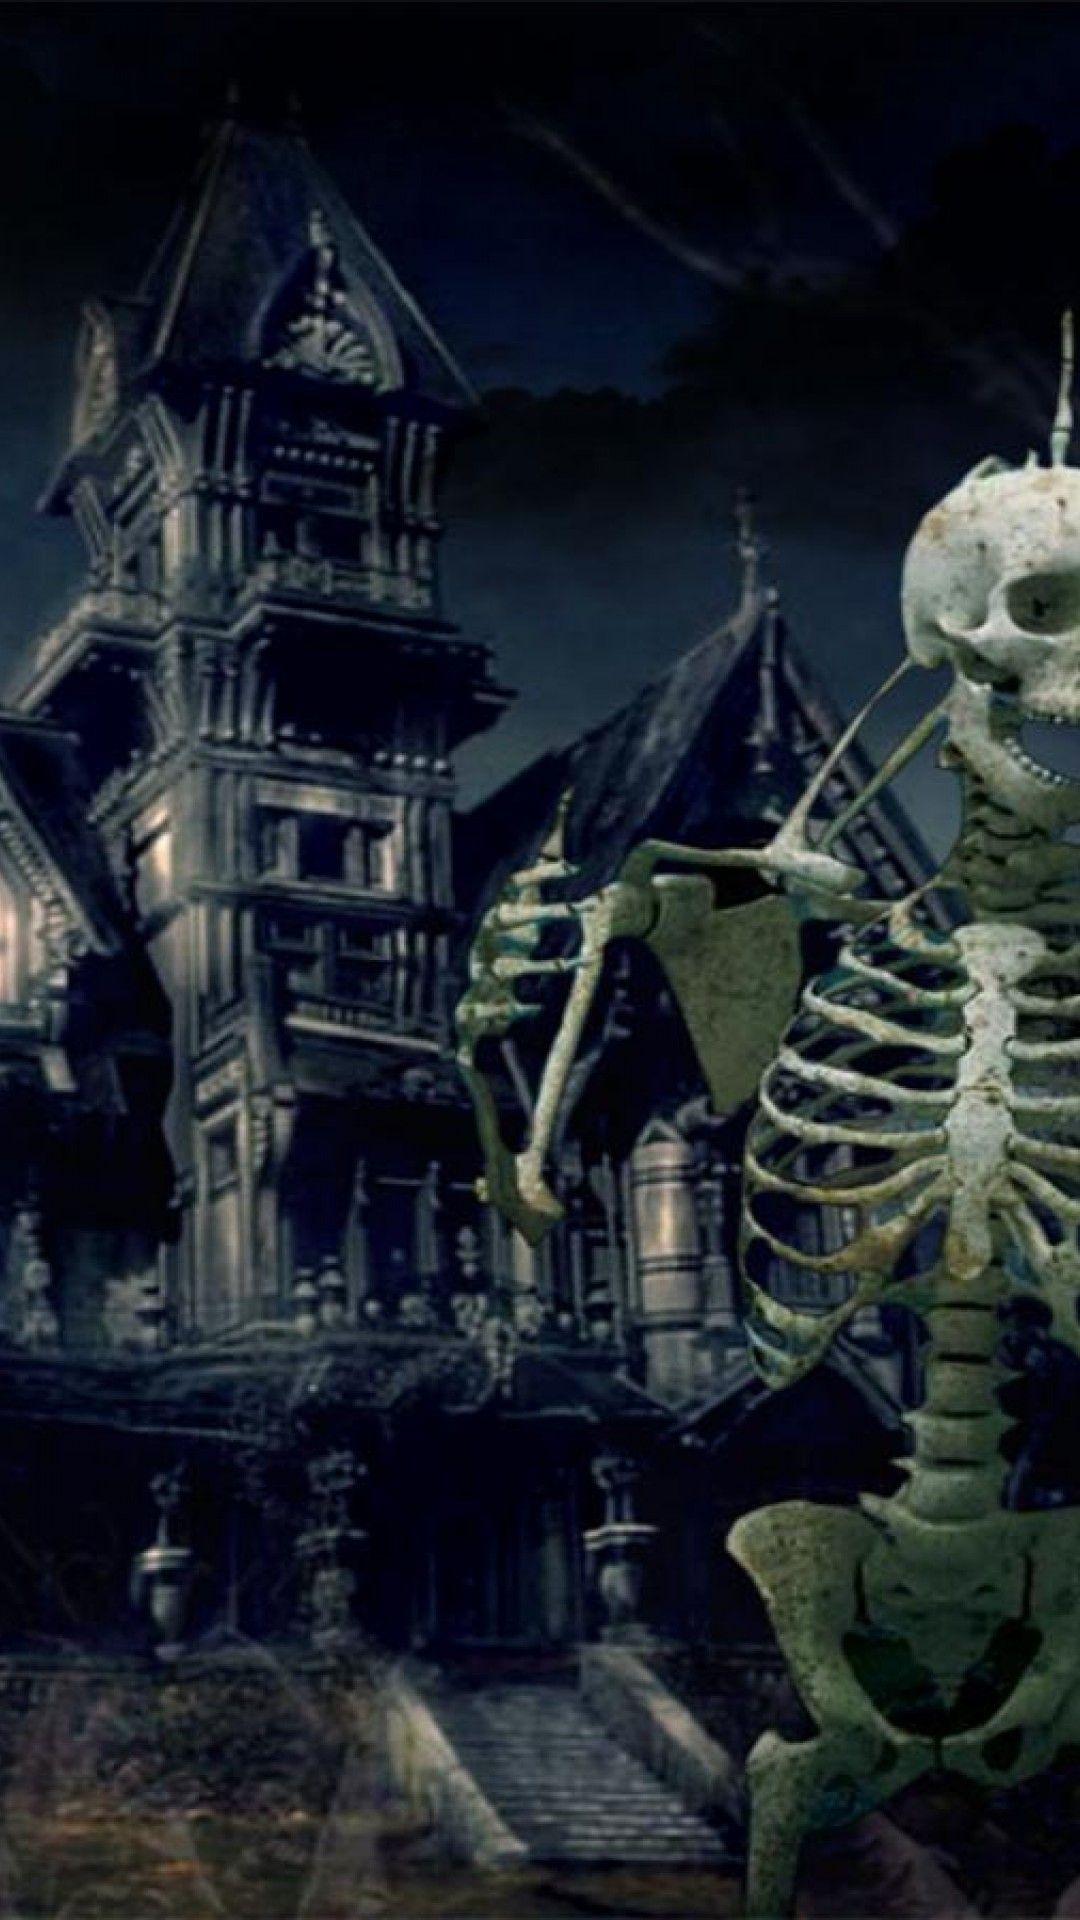 Skeleton wallpaper 1080x1920